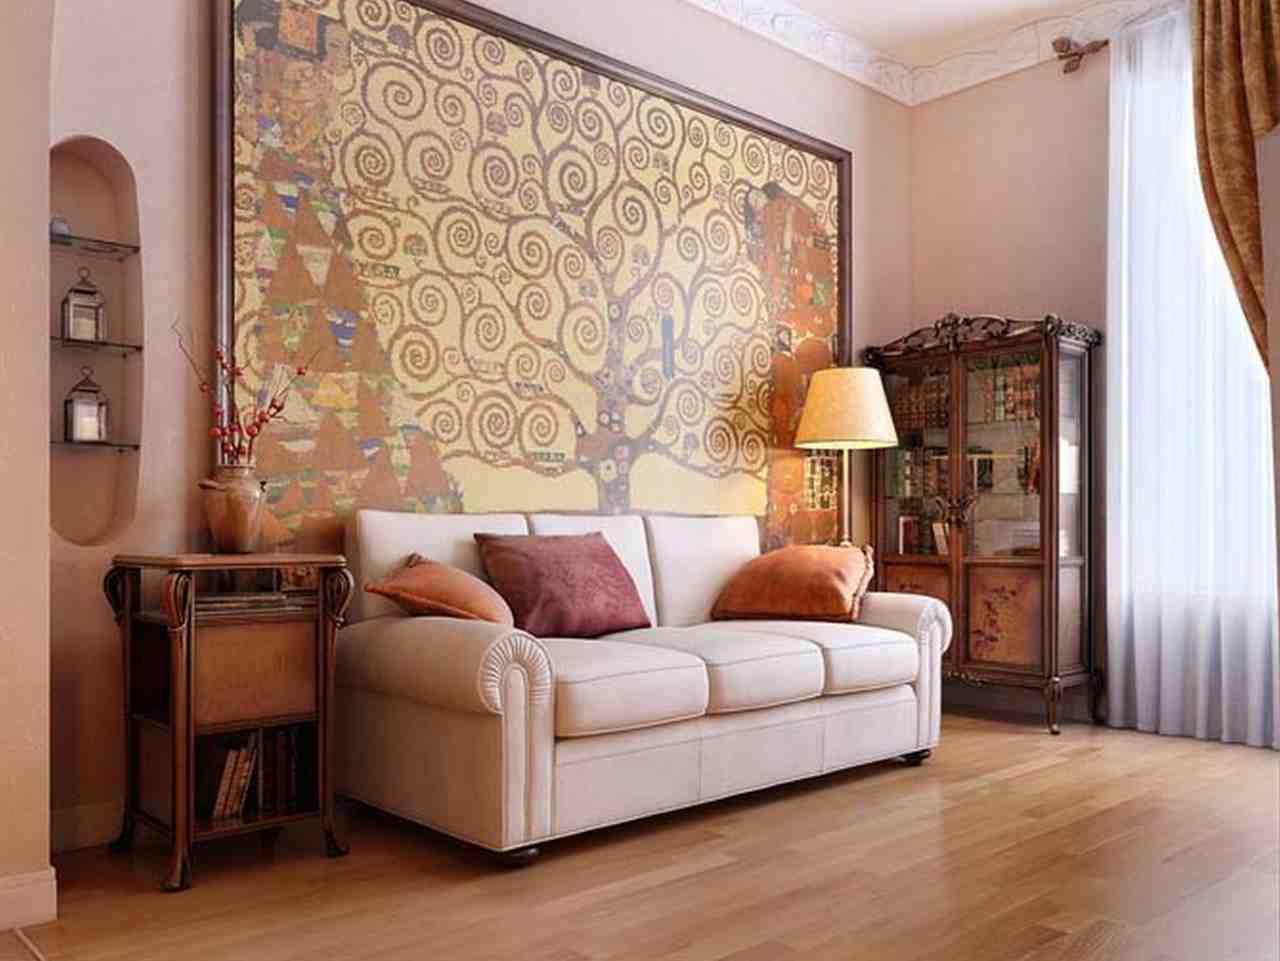 Large Wall Decor Ideas for Living Room - Decor Ideas